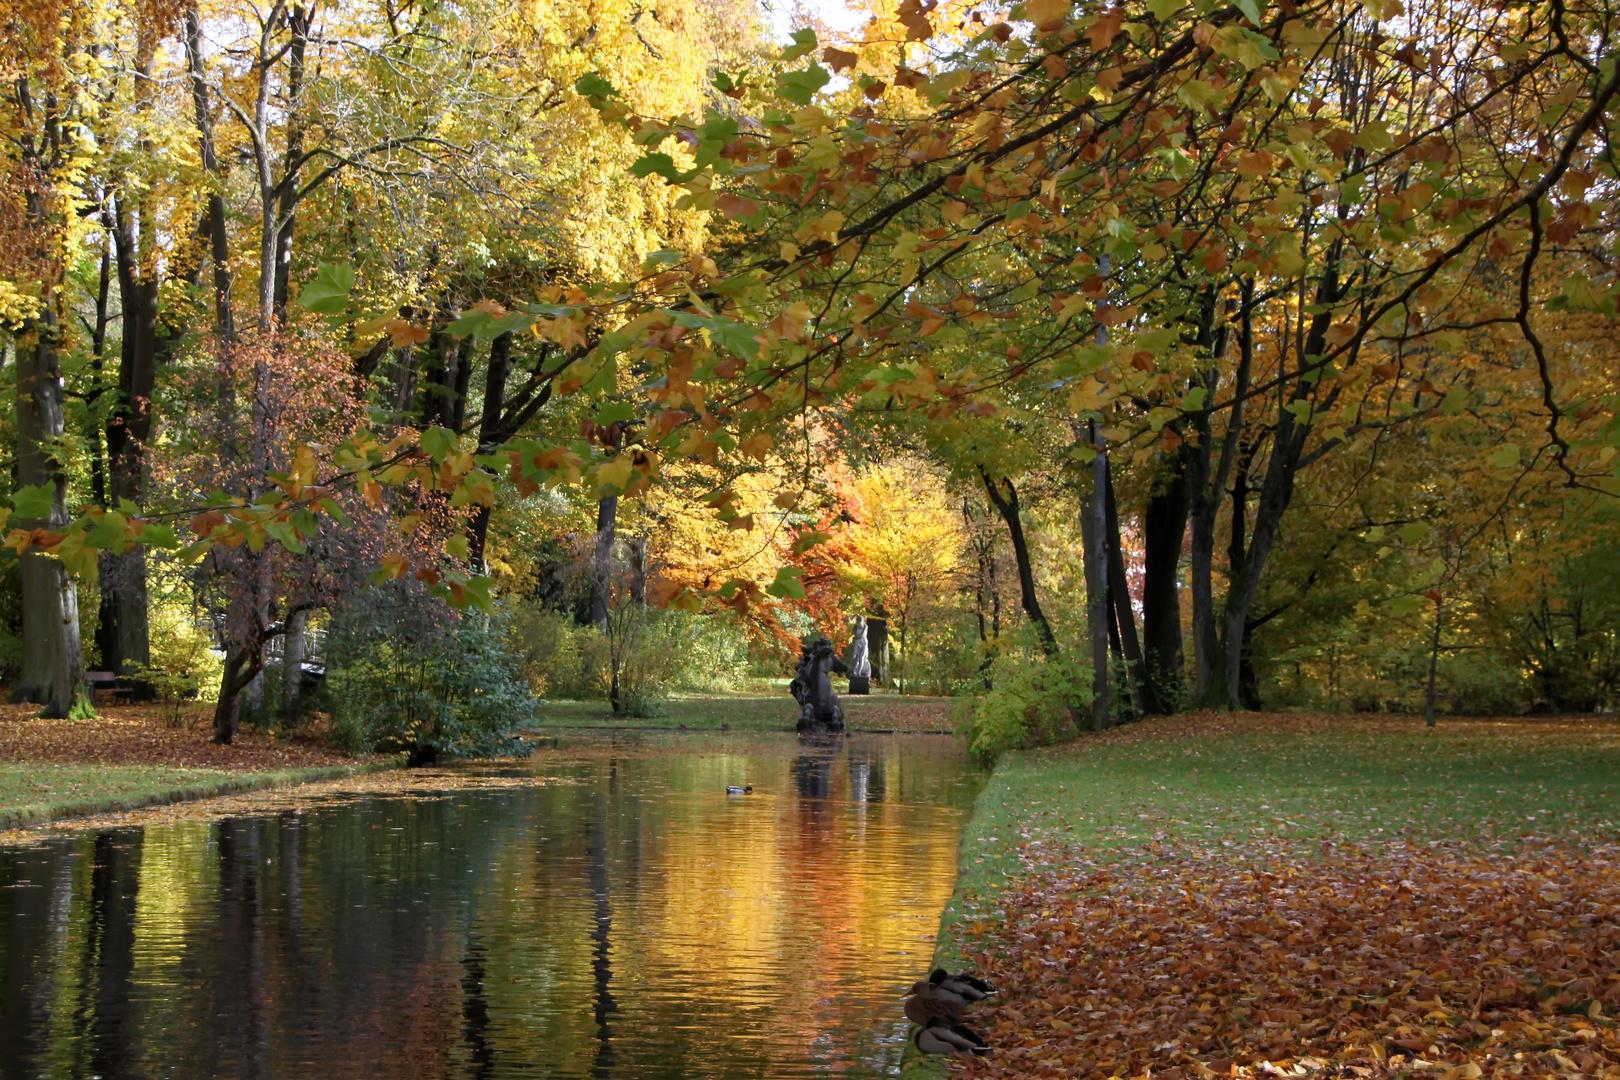 Schloßgarten in Bayreuth II